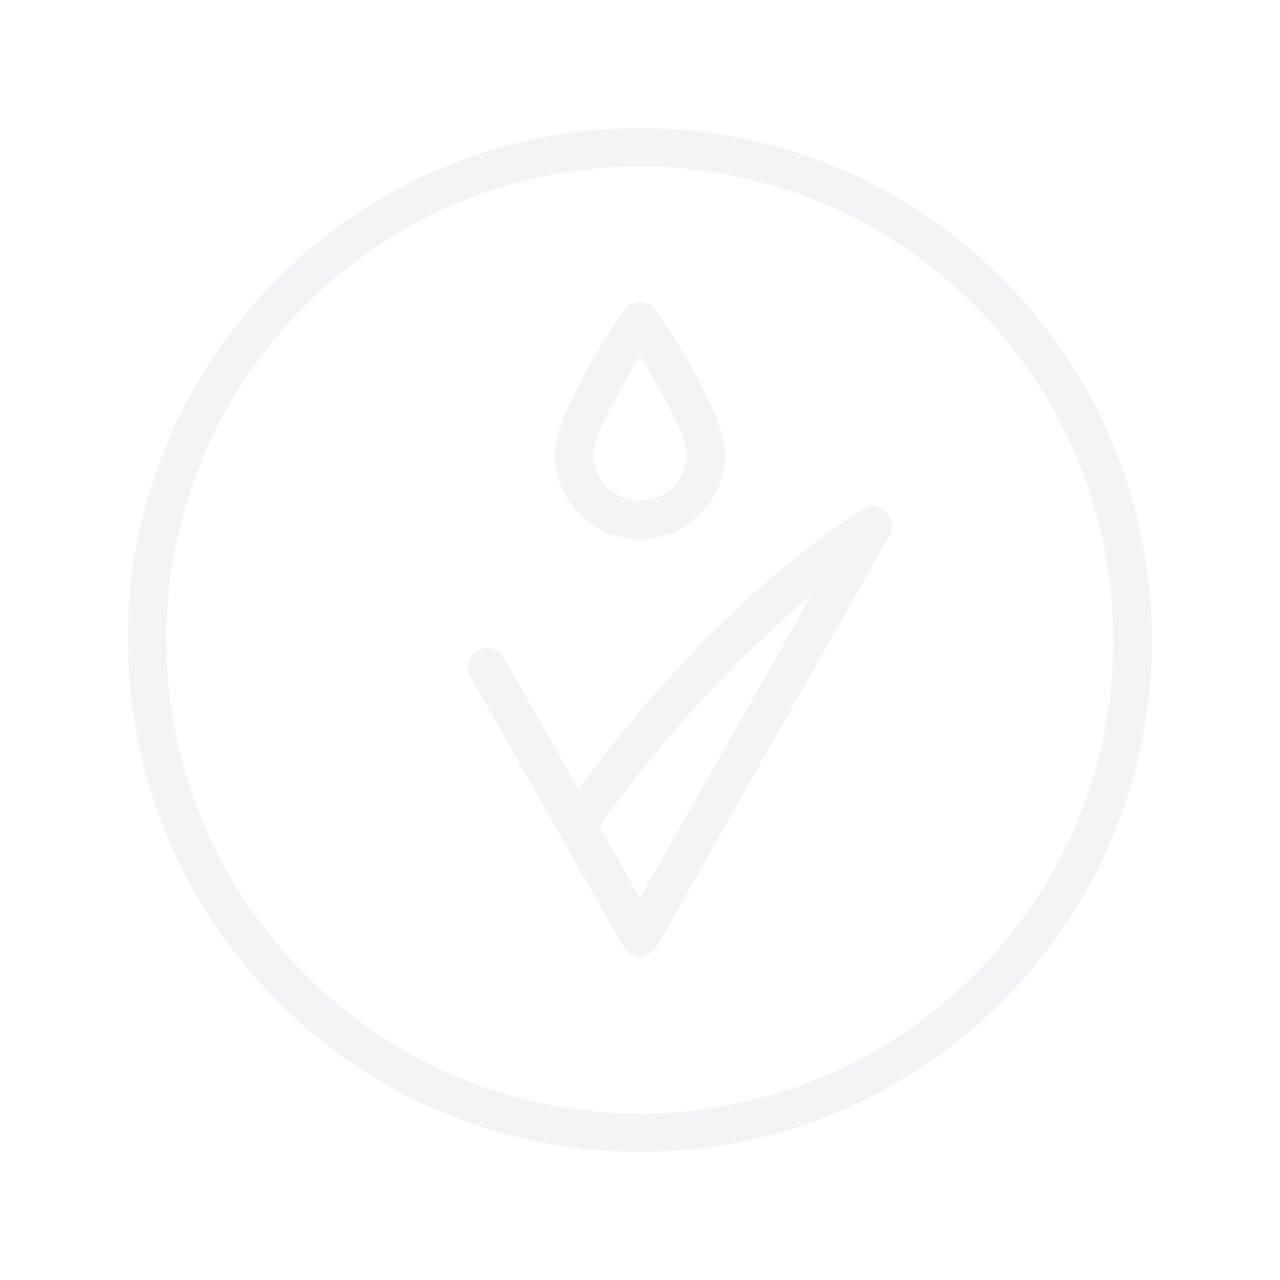 PACO RABANNE Olympea Intense 50ml Eau De Parfum Gift Set